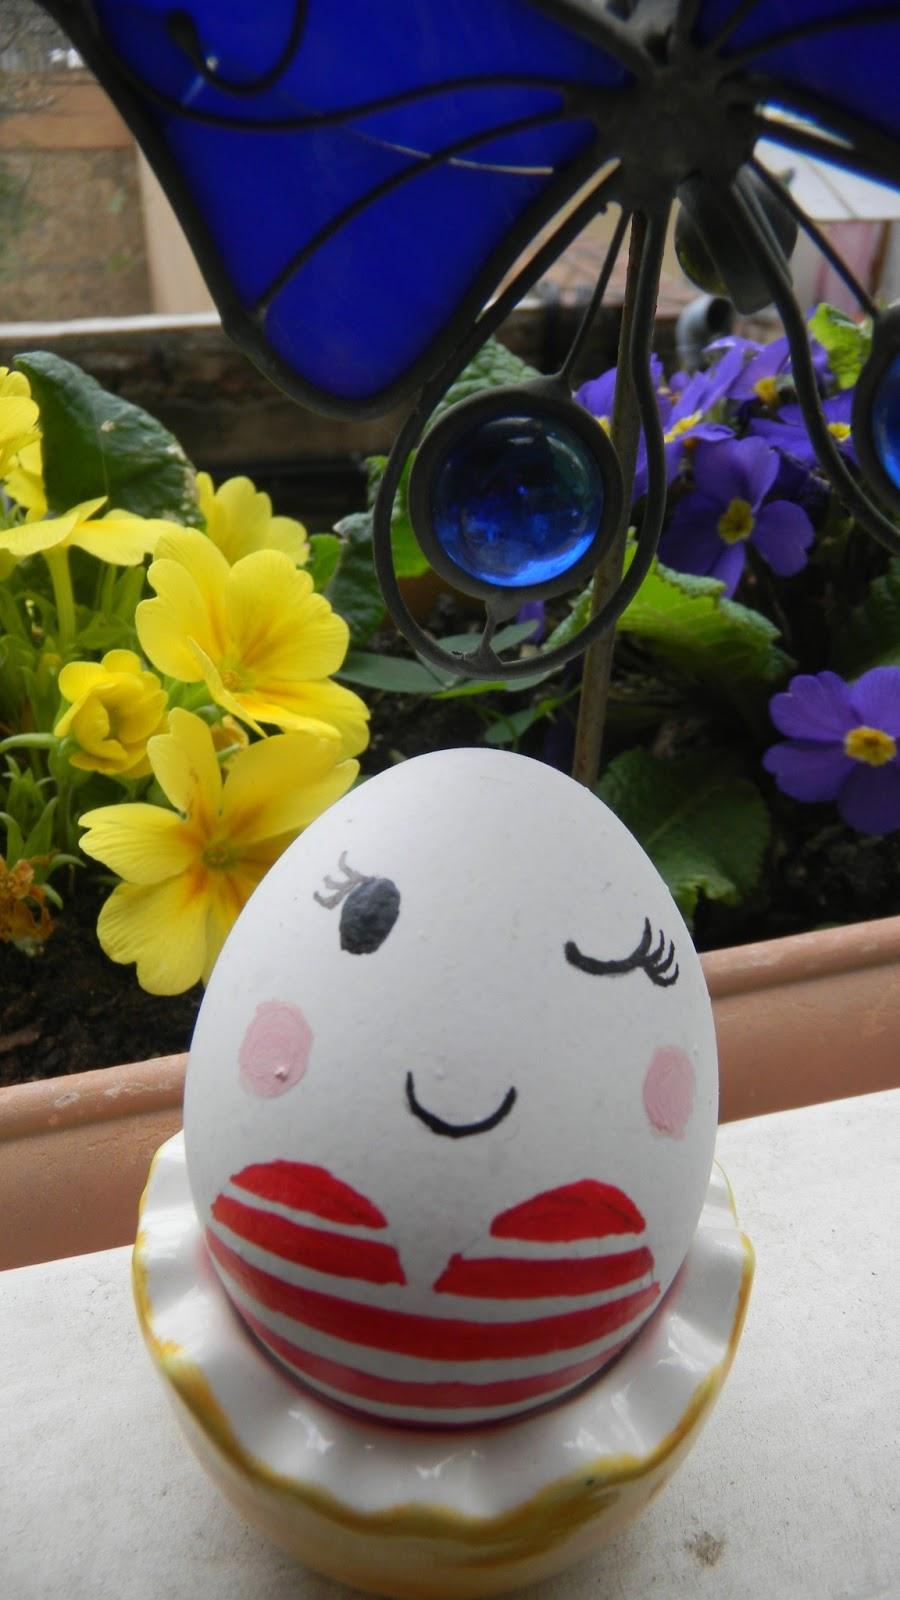 Huevos de pascua decorados - Huevos decorados de pascua ...